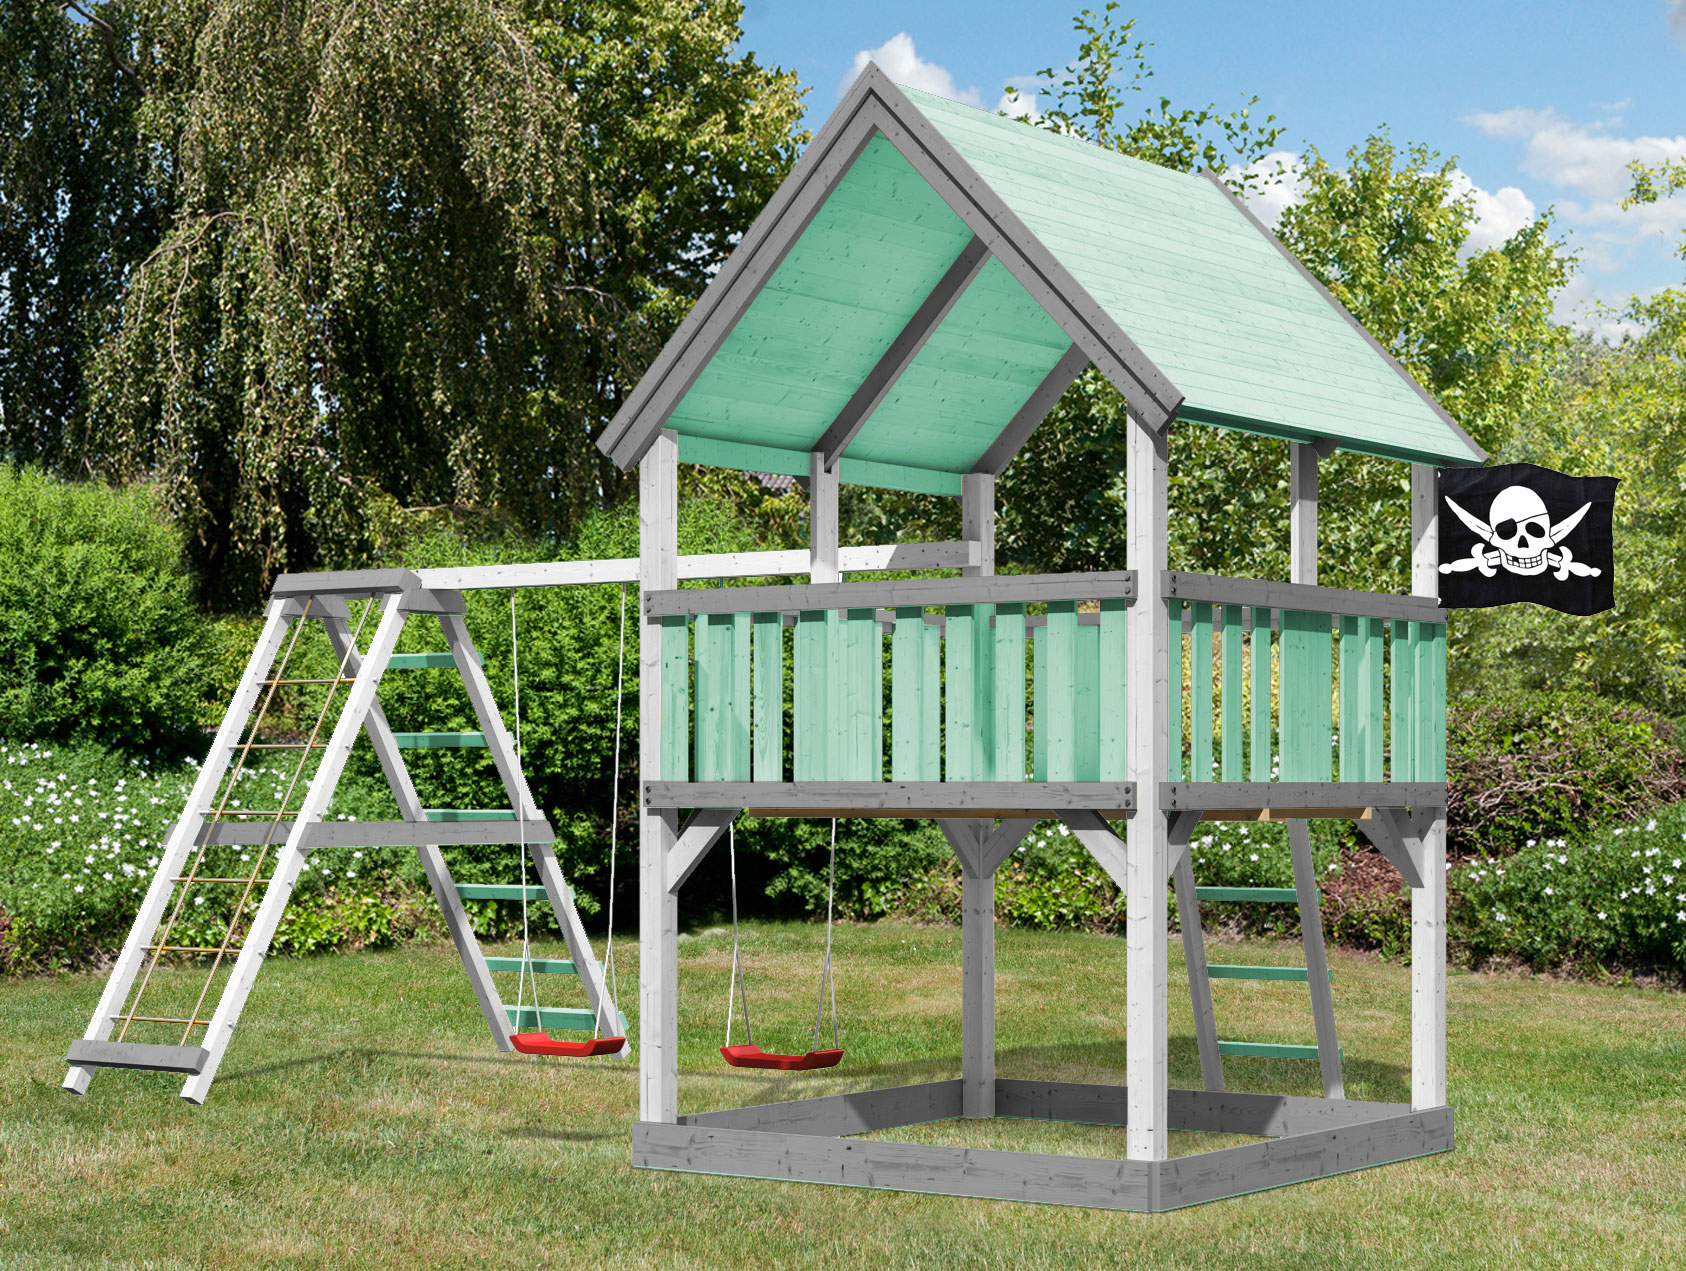 Klettergerüst Natur : Spielturm luis set farbe karibu akubi natur gerüst schaukel bei